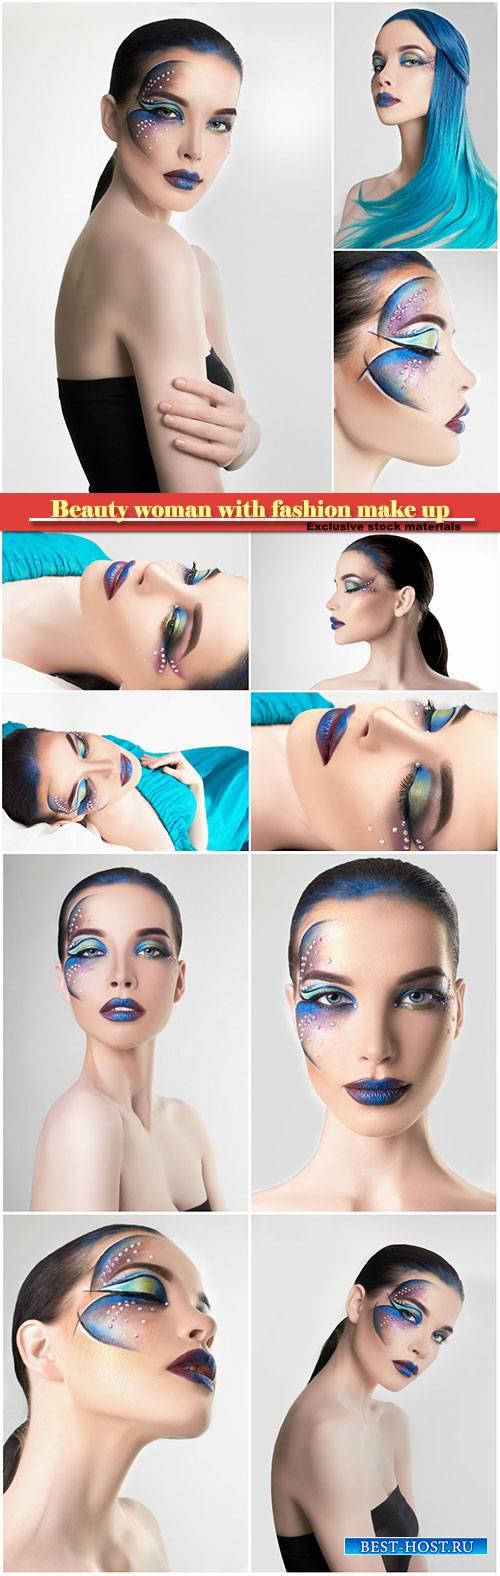 Beauty woman with fashion make up